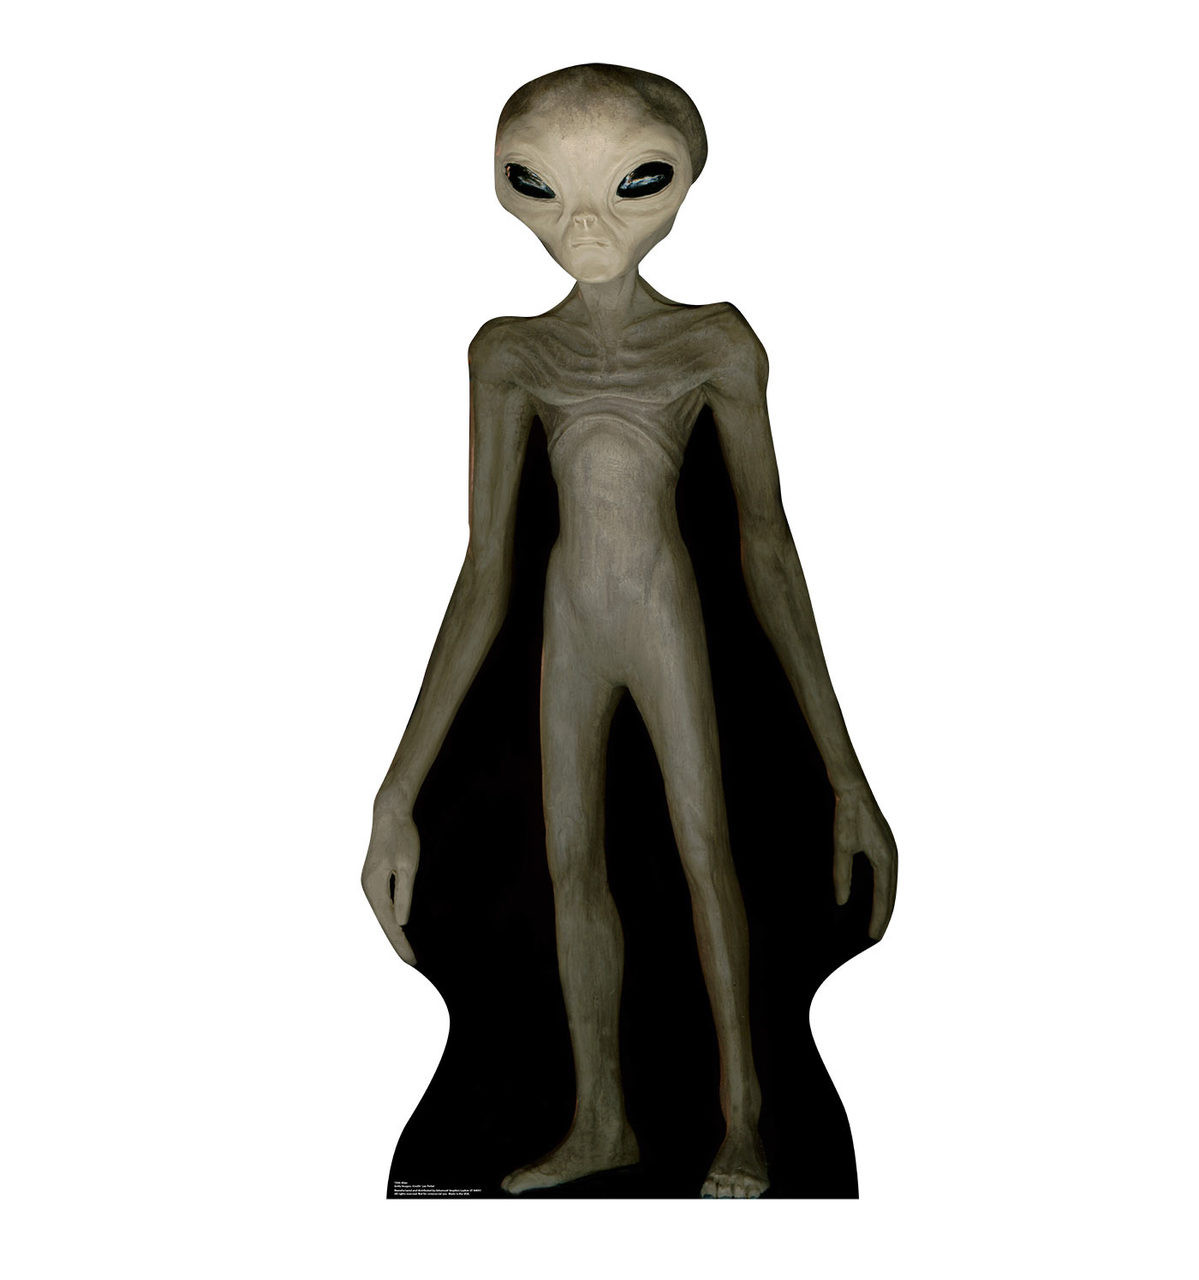 Life-size Alien Cardboard Standup 2